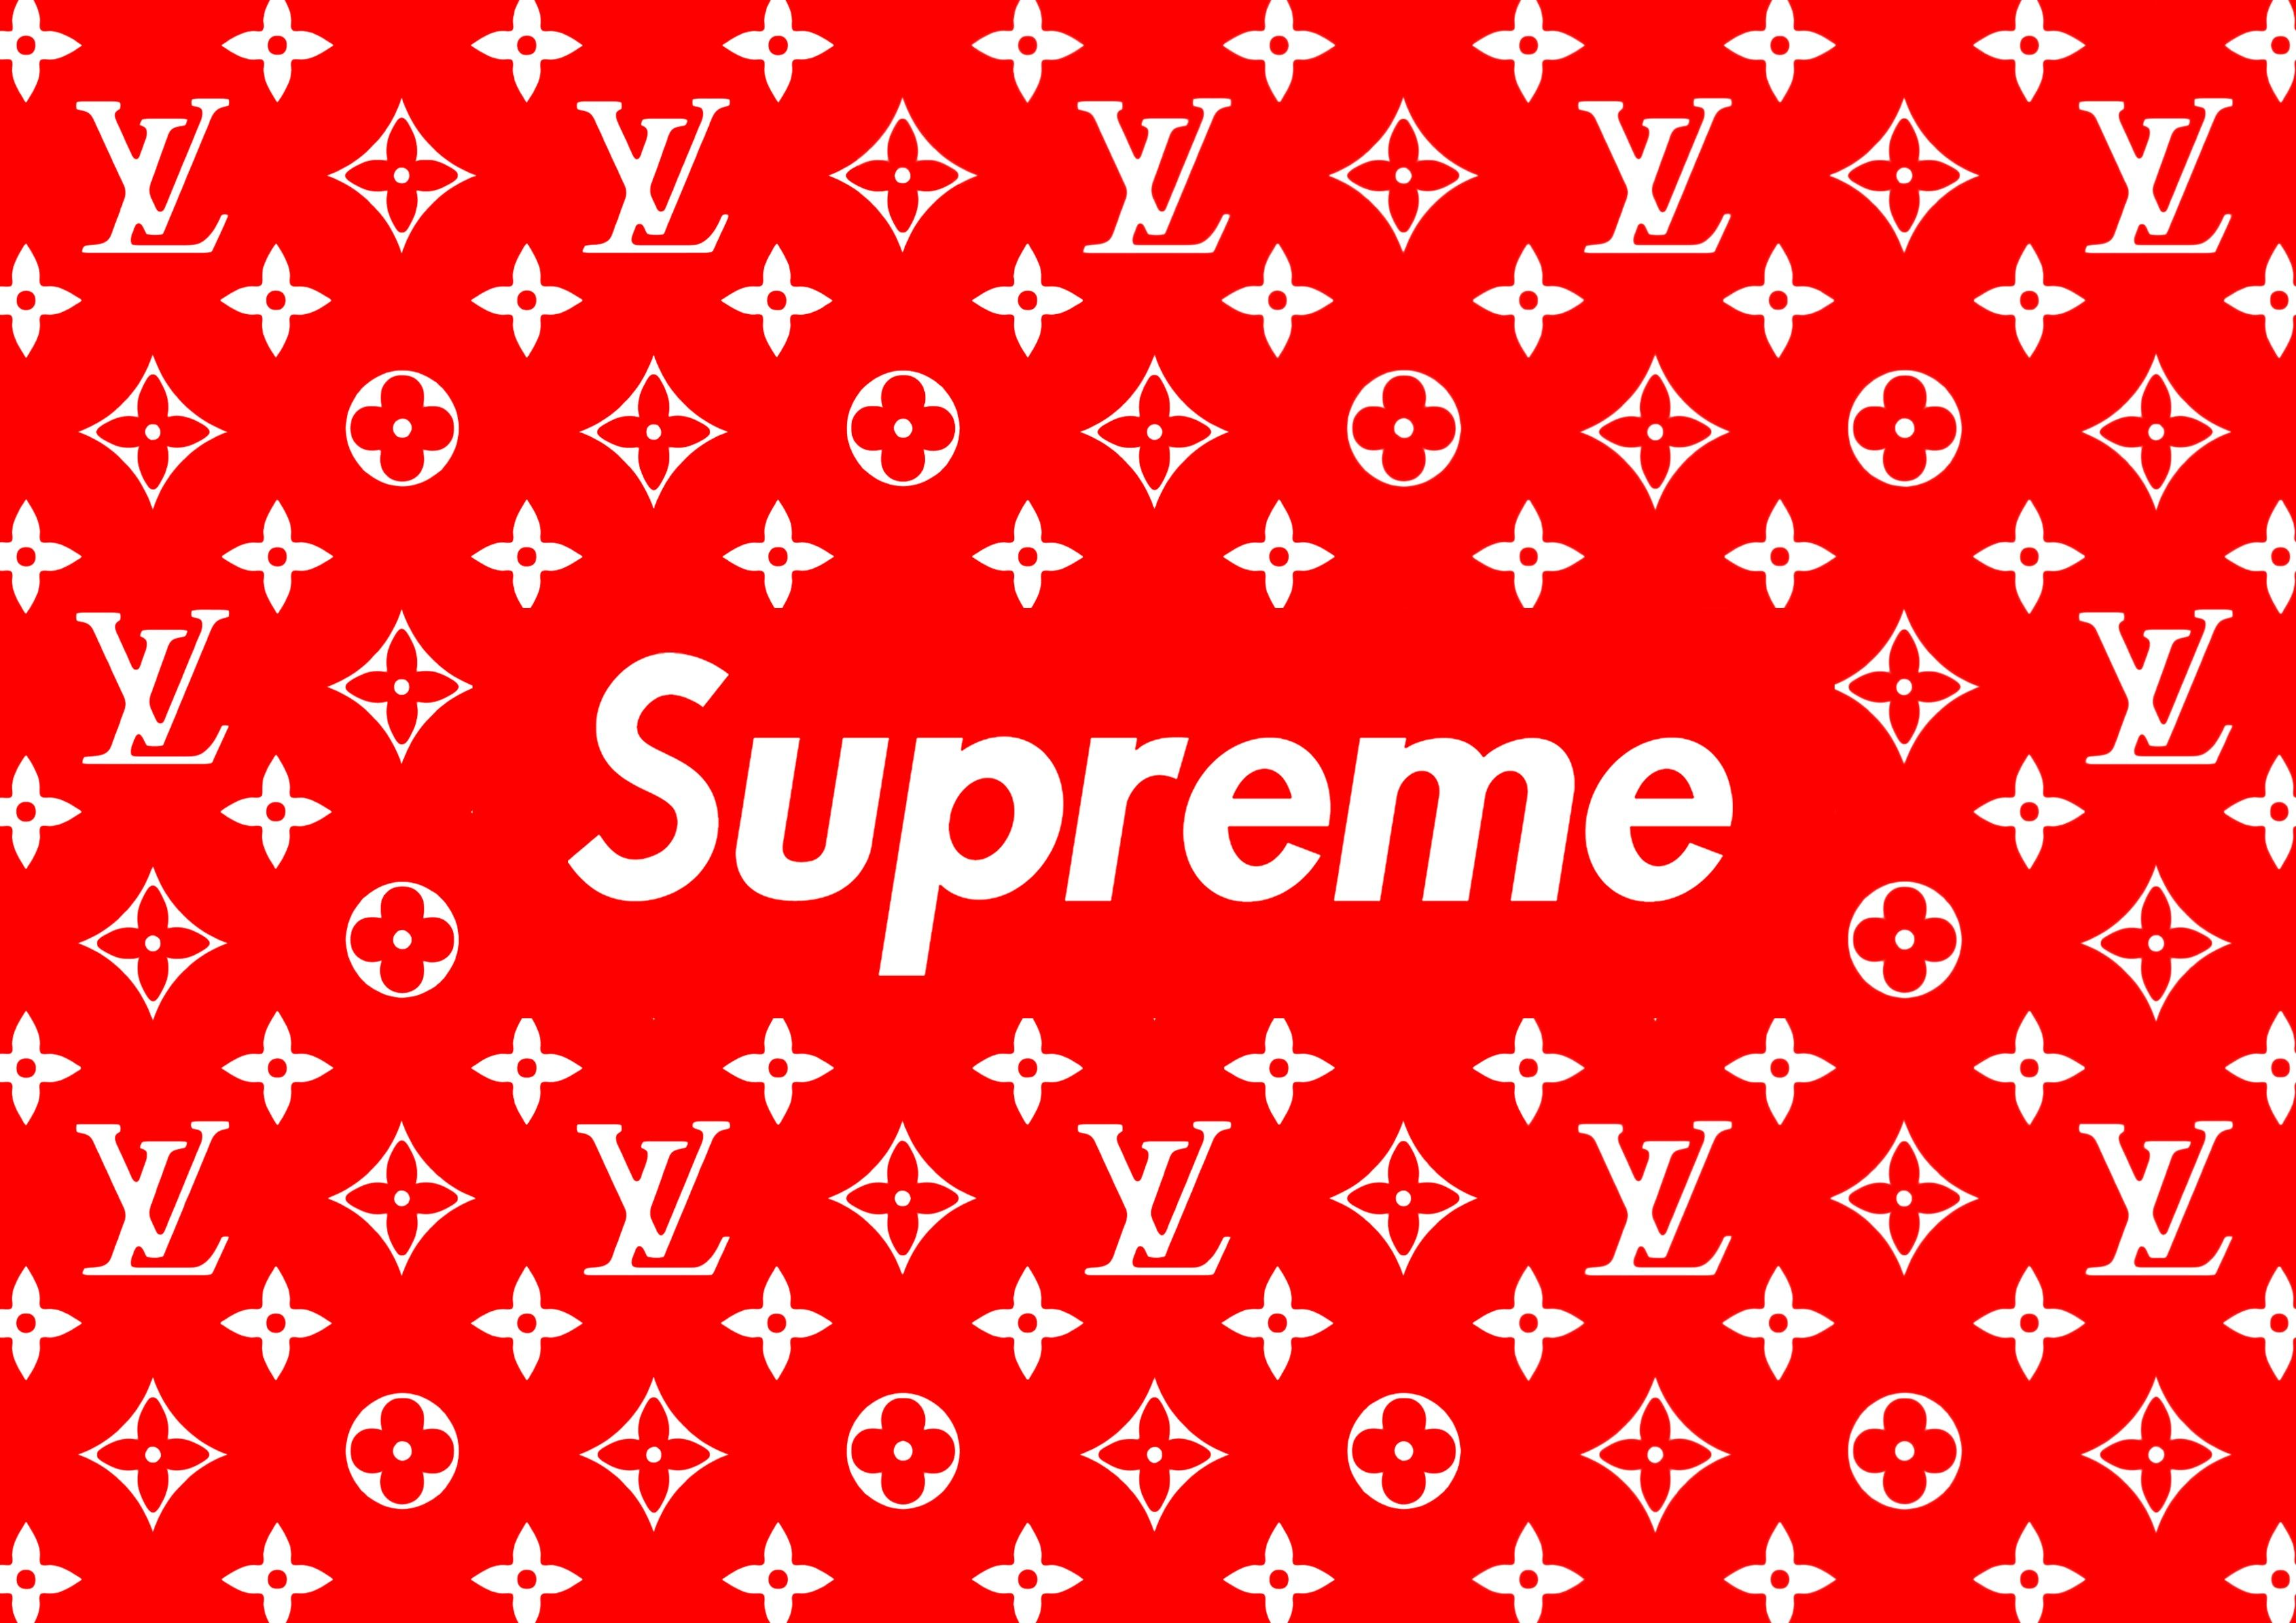 Elegant Louis Vuitton Supreme Background Supreme Wallpaper Supreme Background Louis Vuitton Iphone Wallpaper